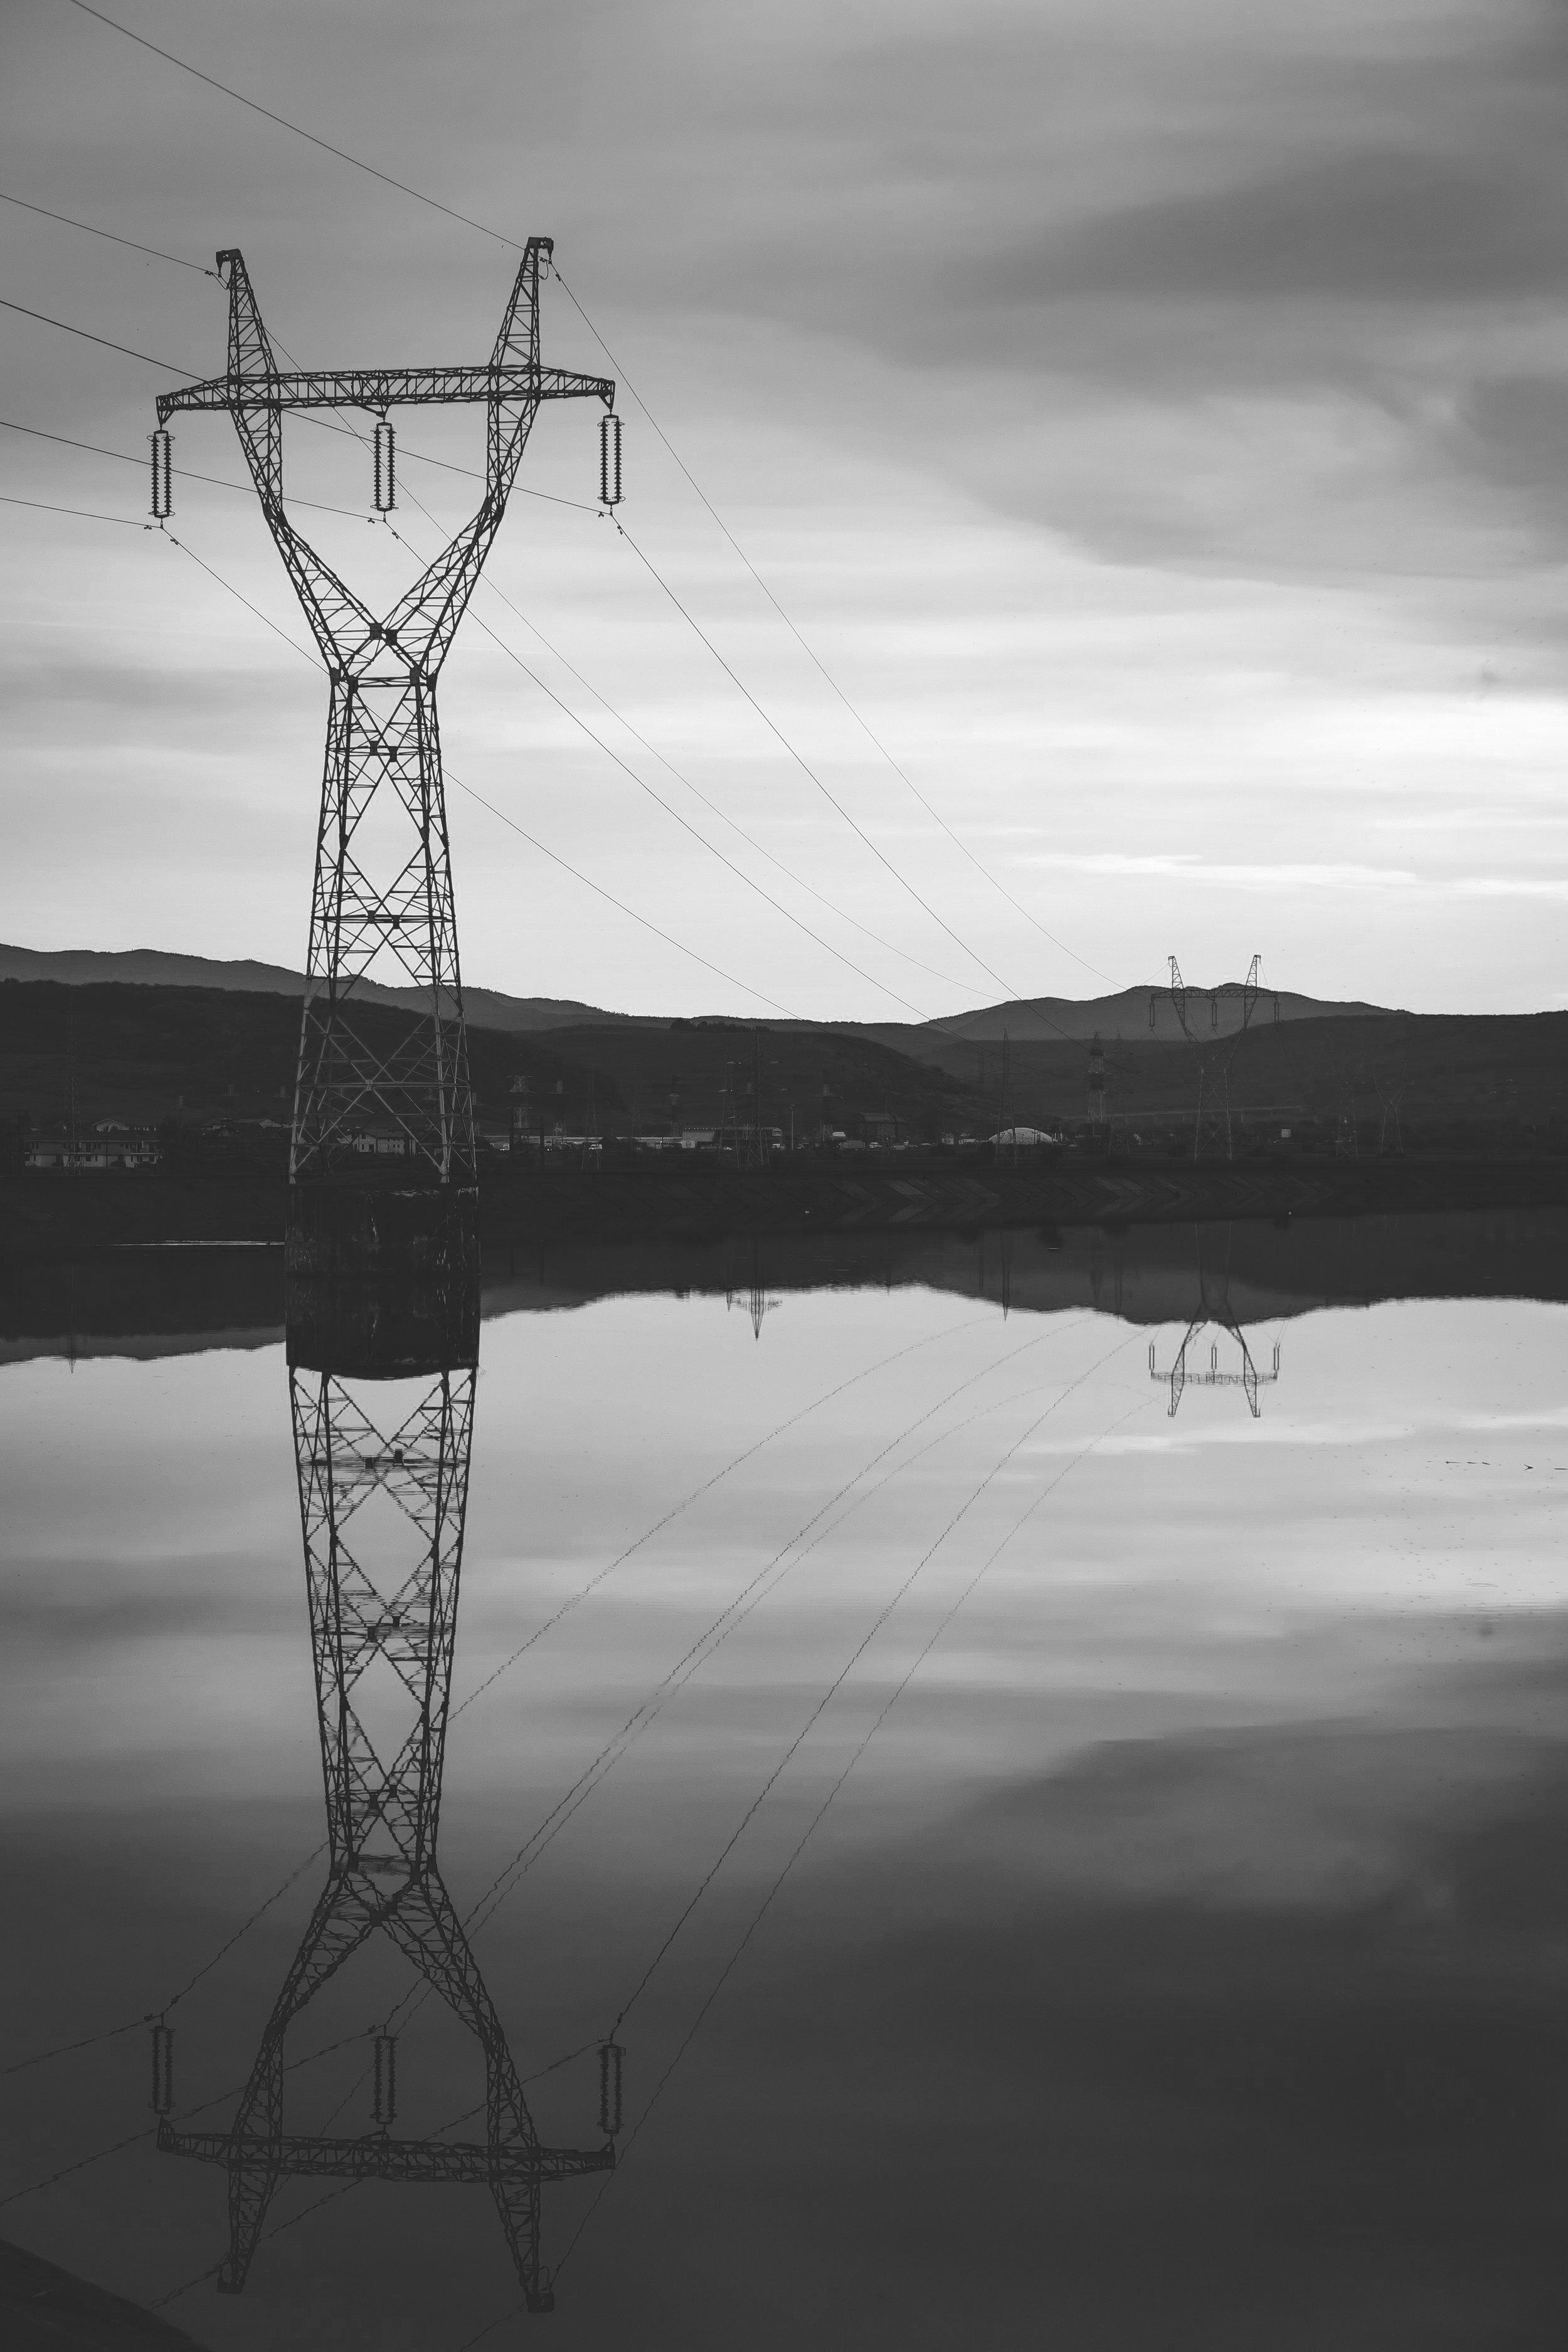 Transmission Pylons